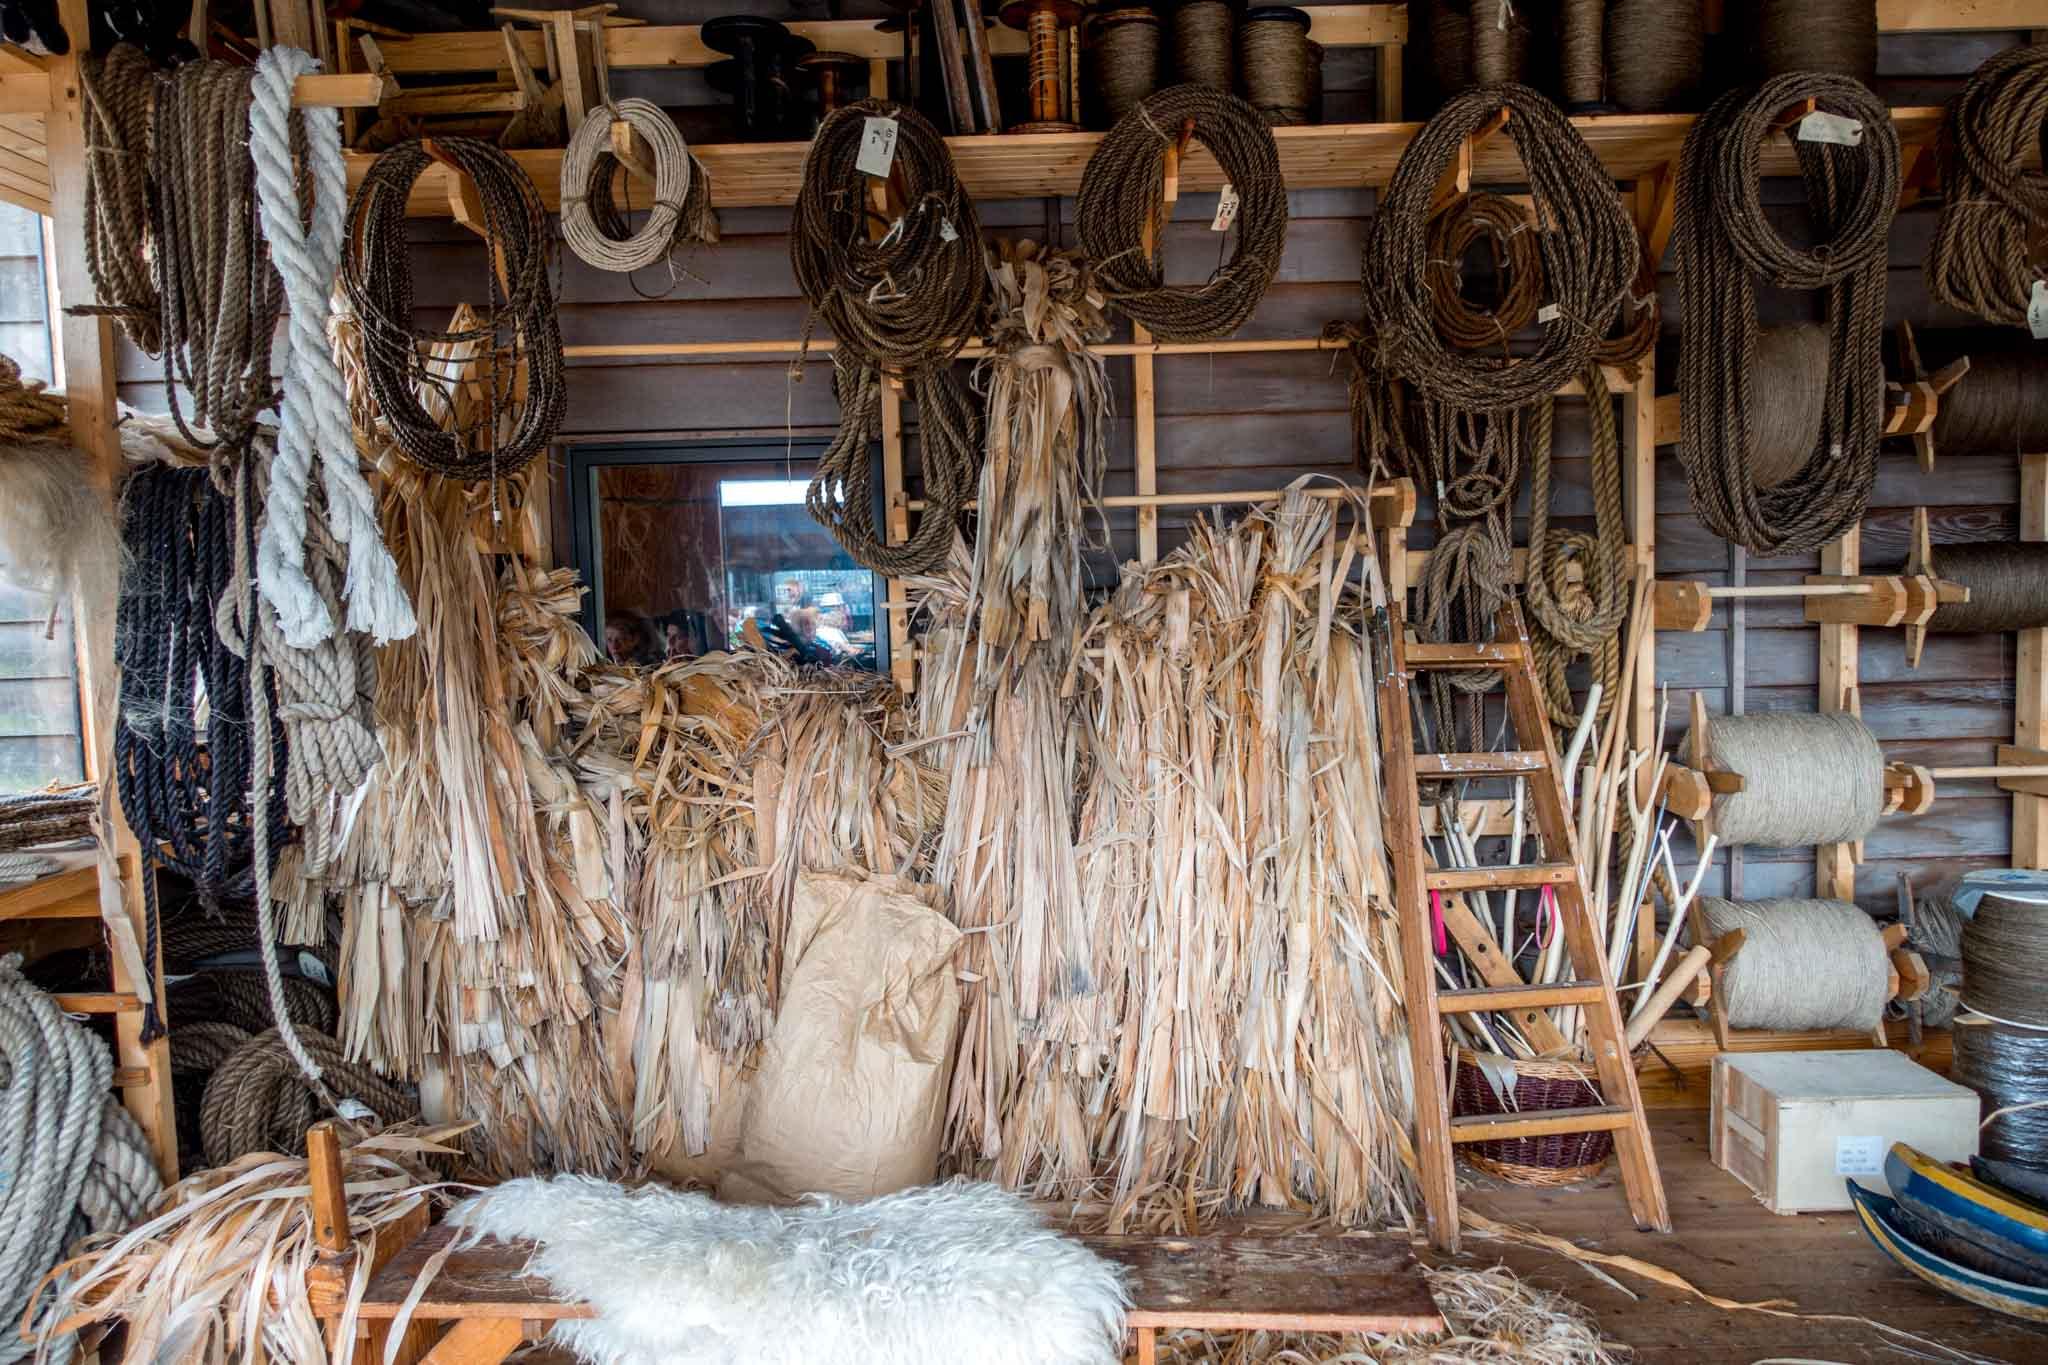 Rope-making equipment at the Roskilde Viking Museum